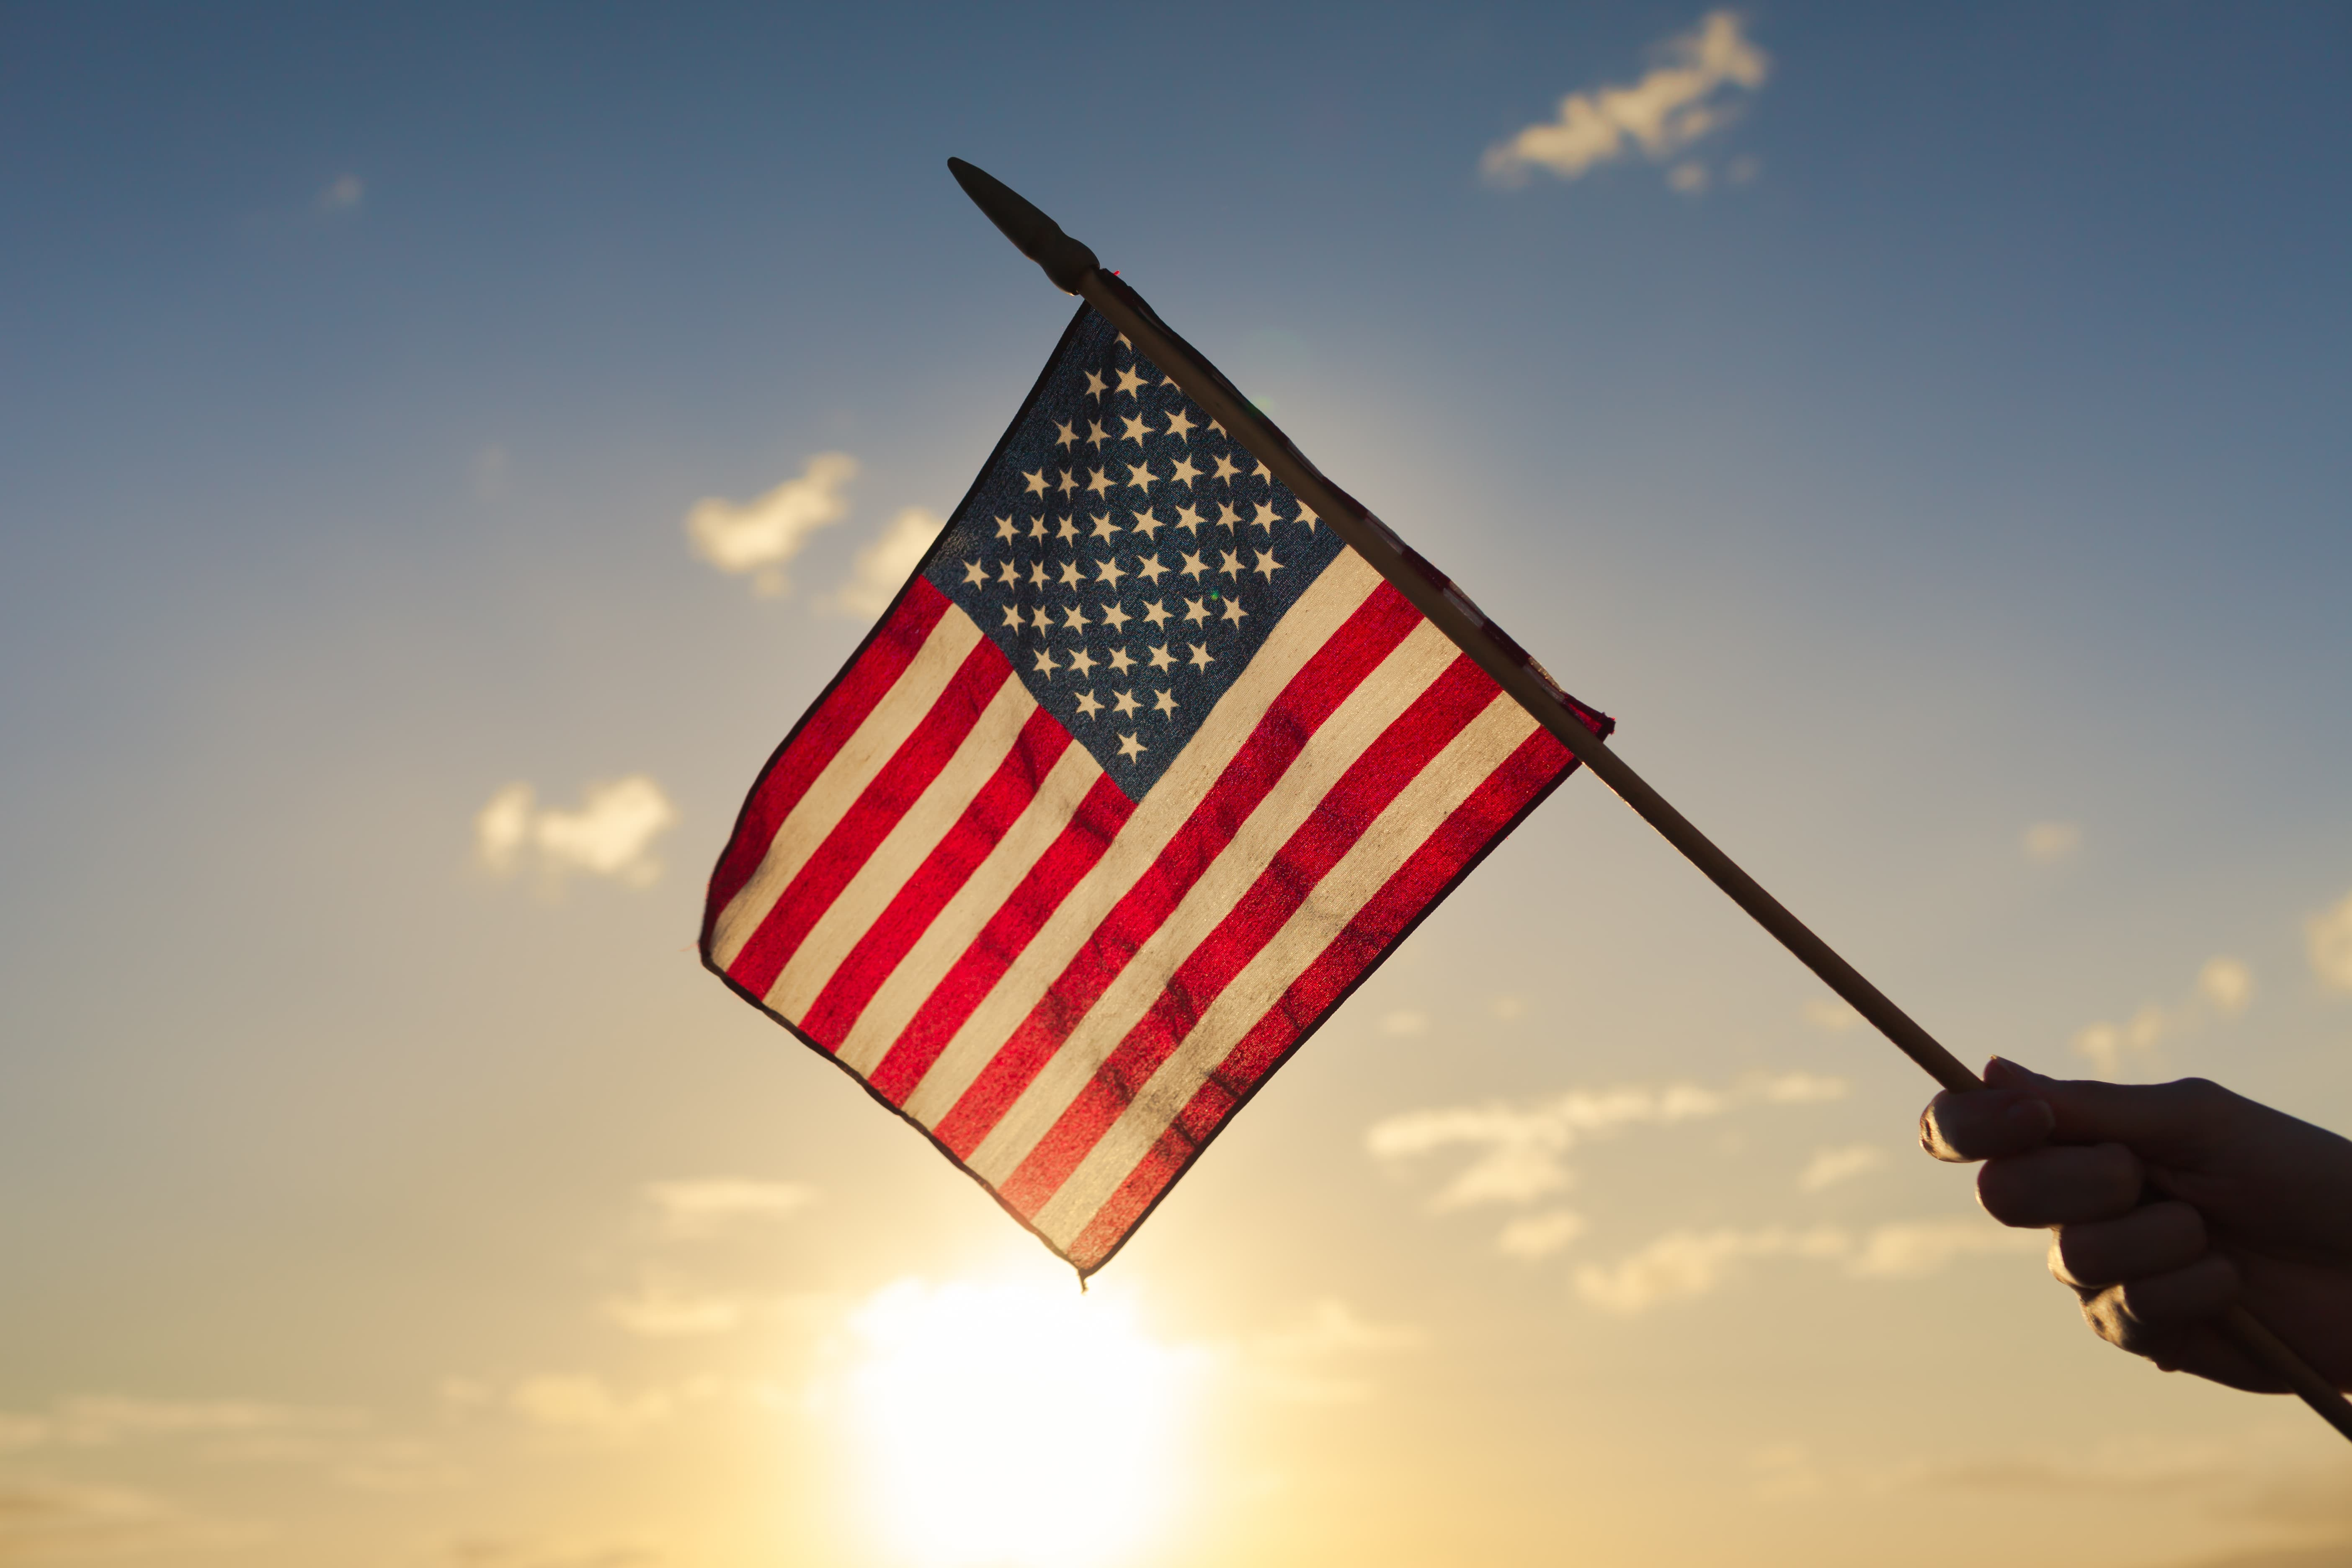 iStock-514069232 SEIA Names Abigail Ross Hopper New Head Of U.S. Solar Industry